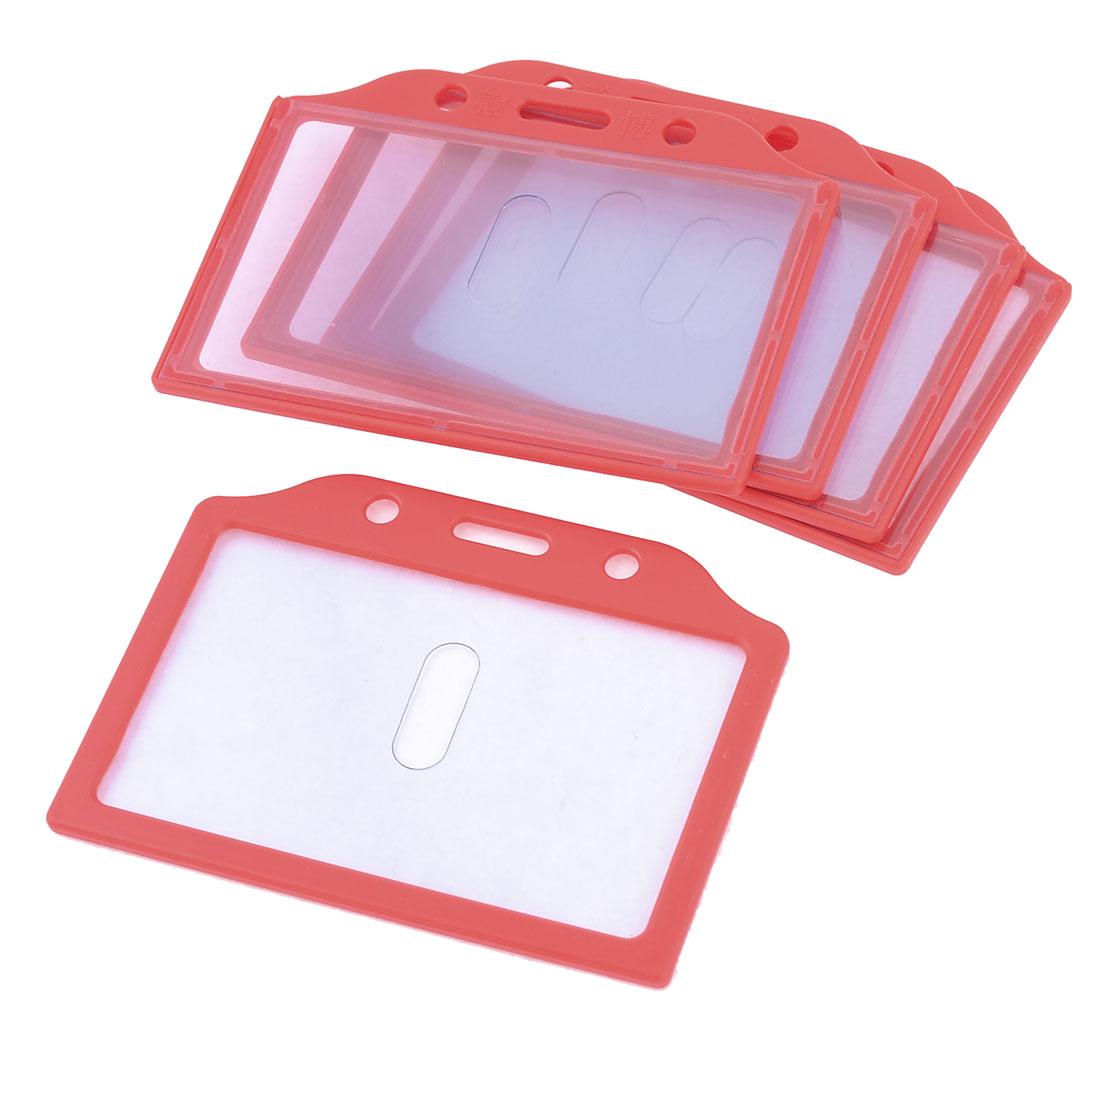 5pcs Red Plastic Frame Vertical School Slide ID Card Holder 85mm x 52mm